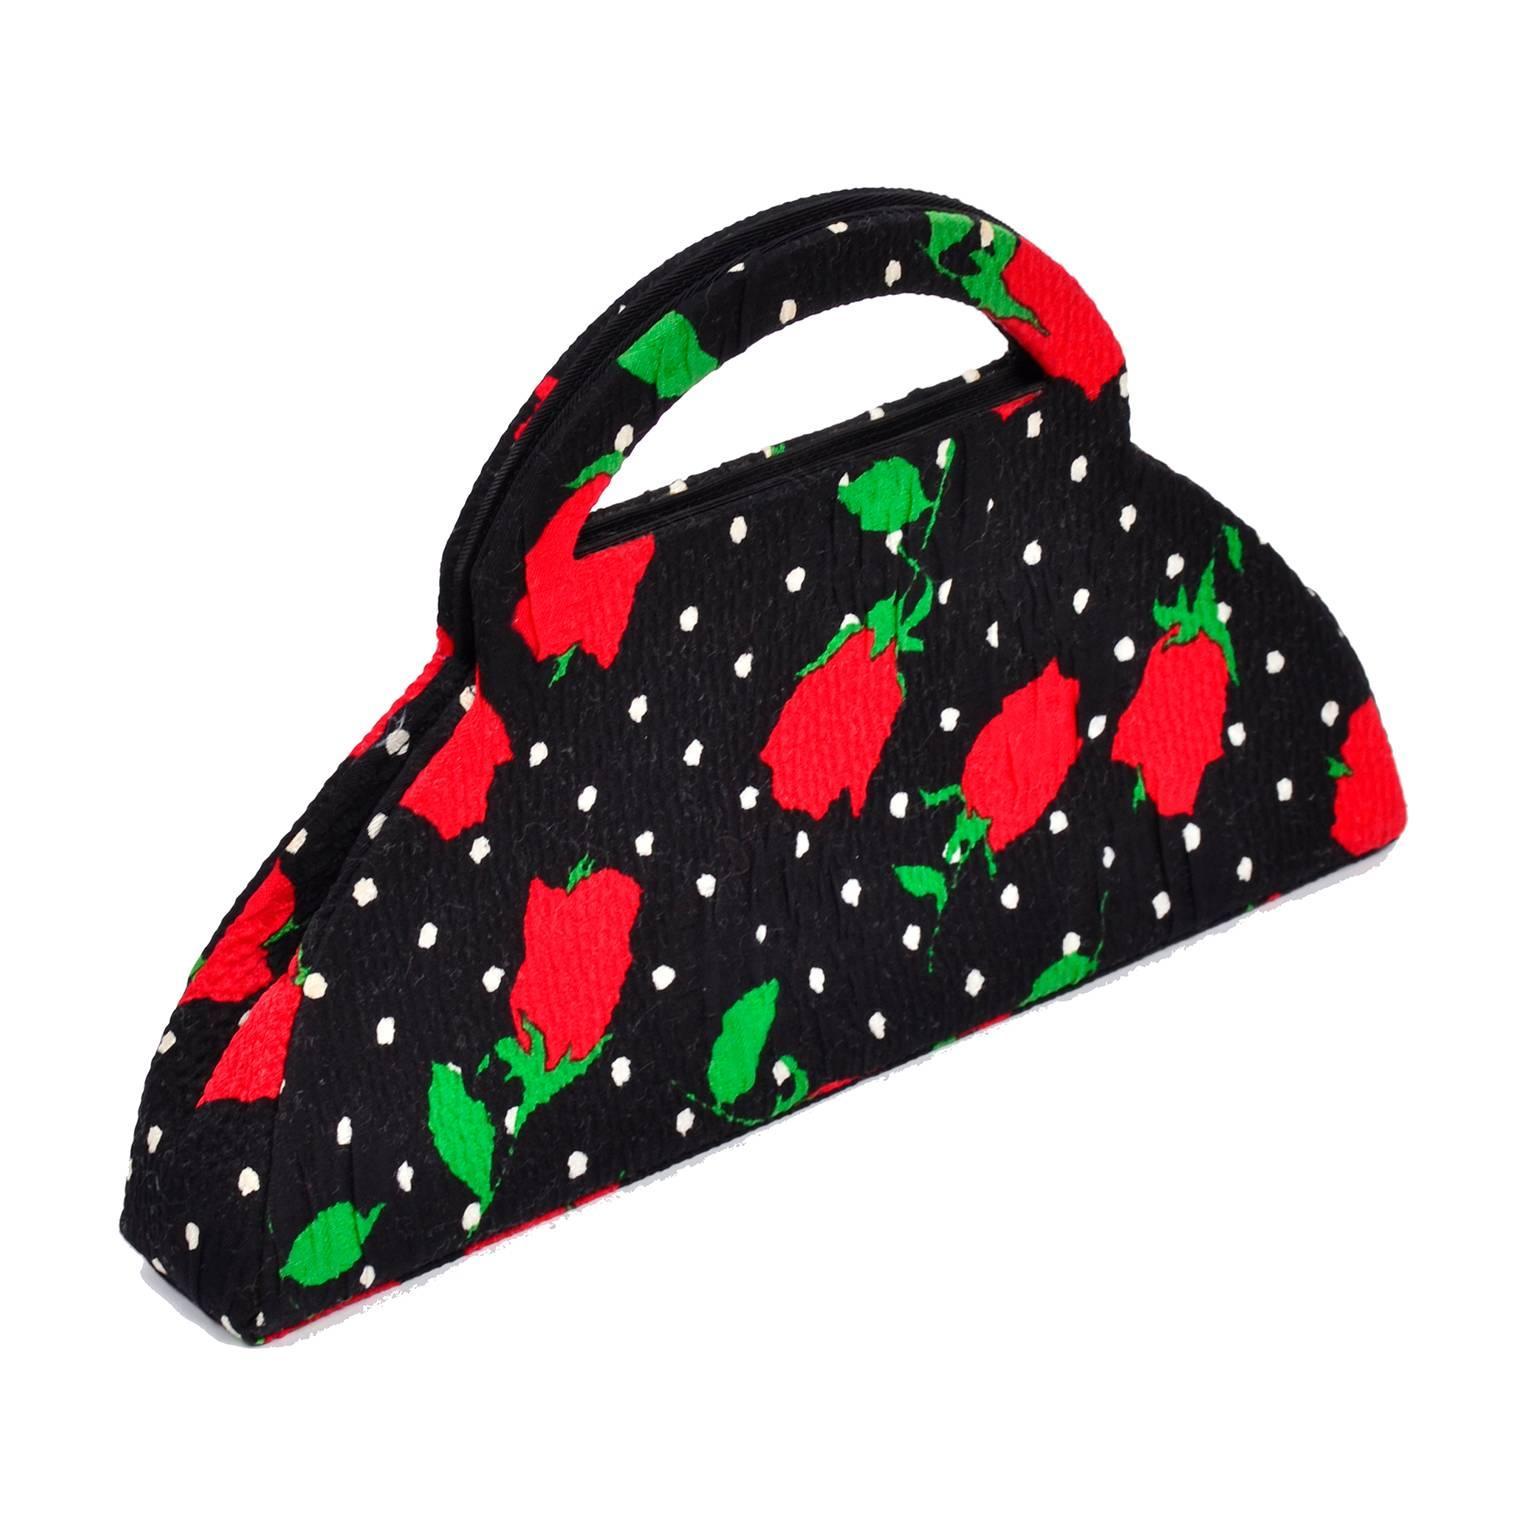 Christian Lacroix 1988 Christian Lacroix Handbag In Red Roses & White Polka Dots On Black Fabric 3Skltz3